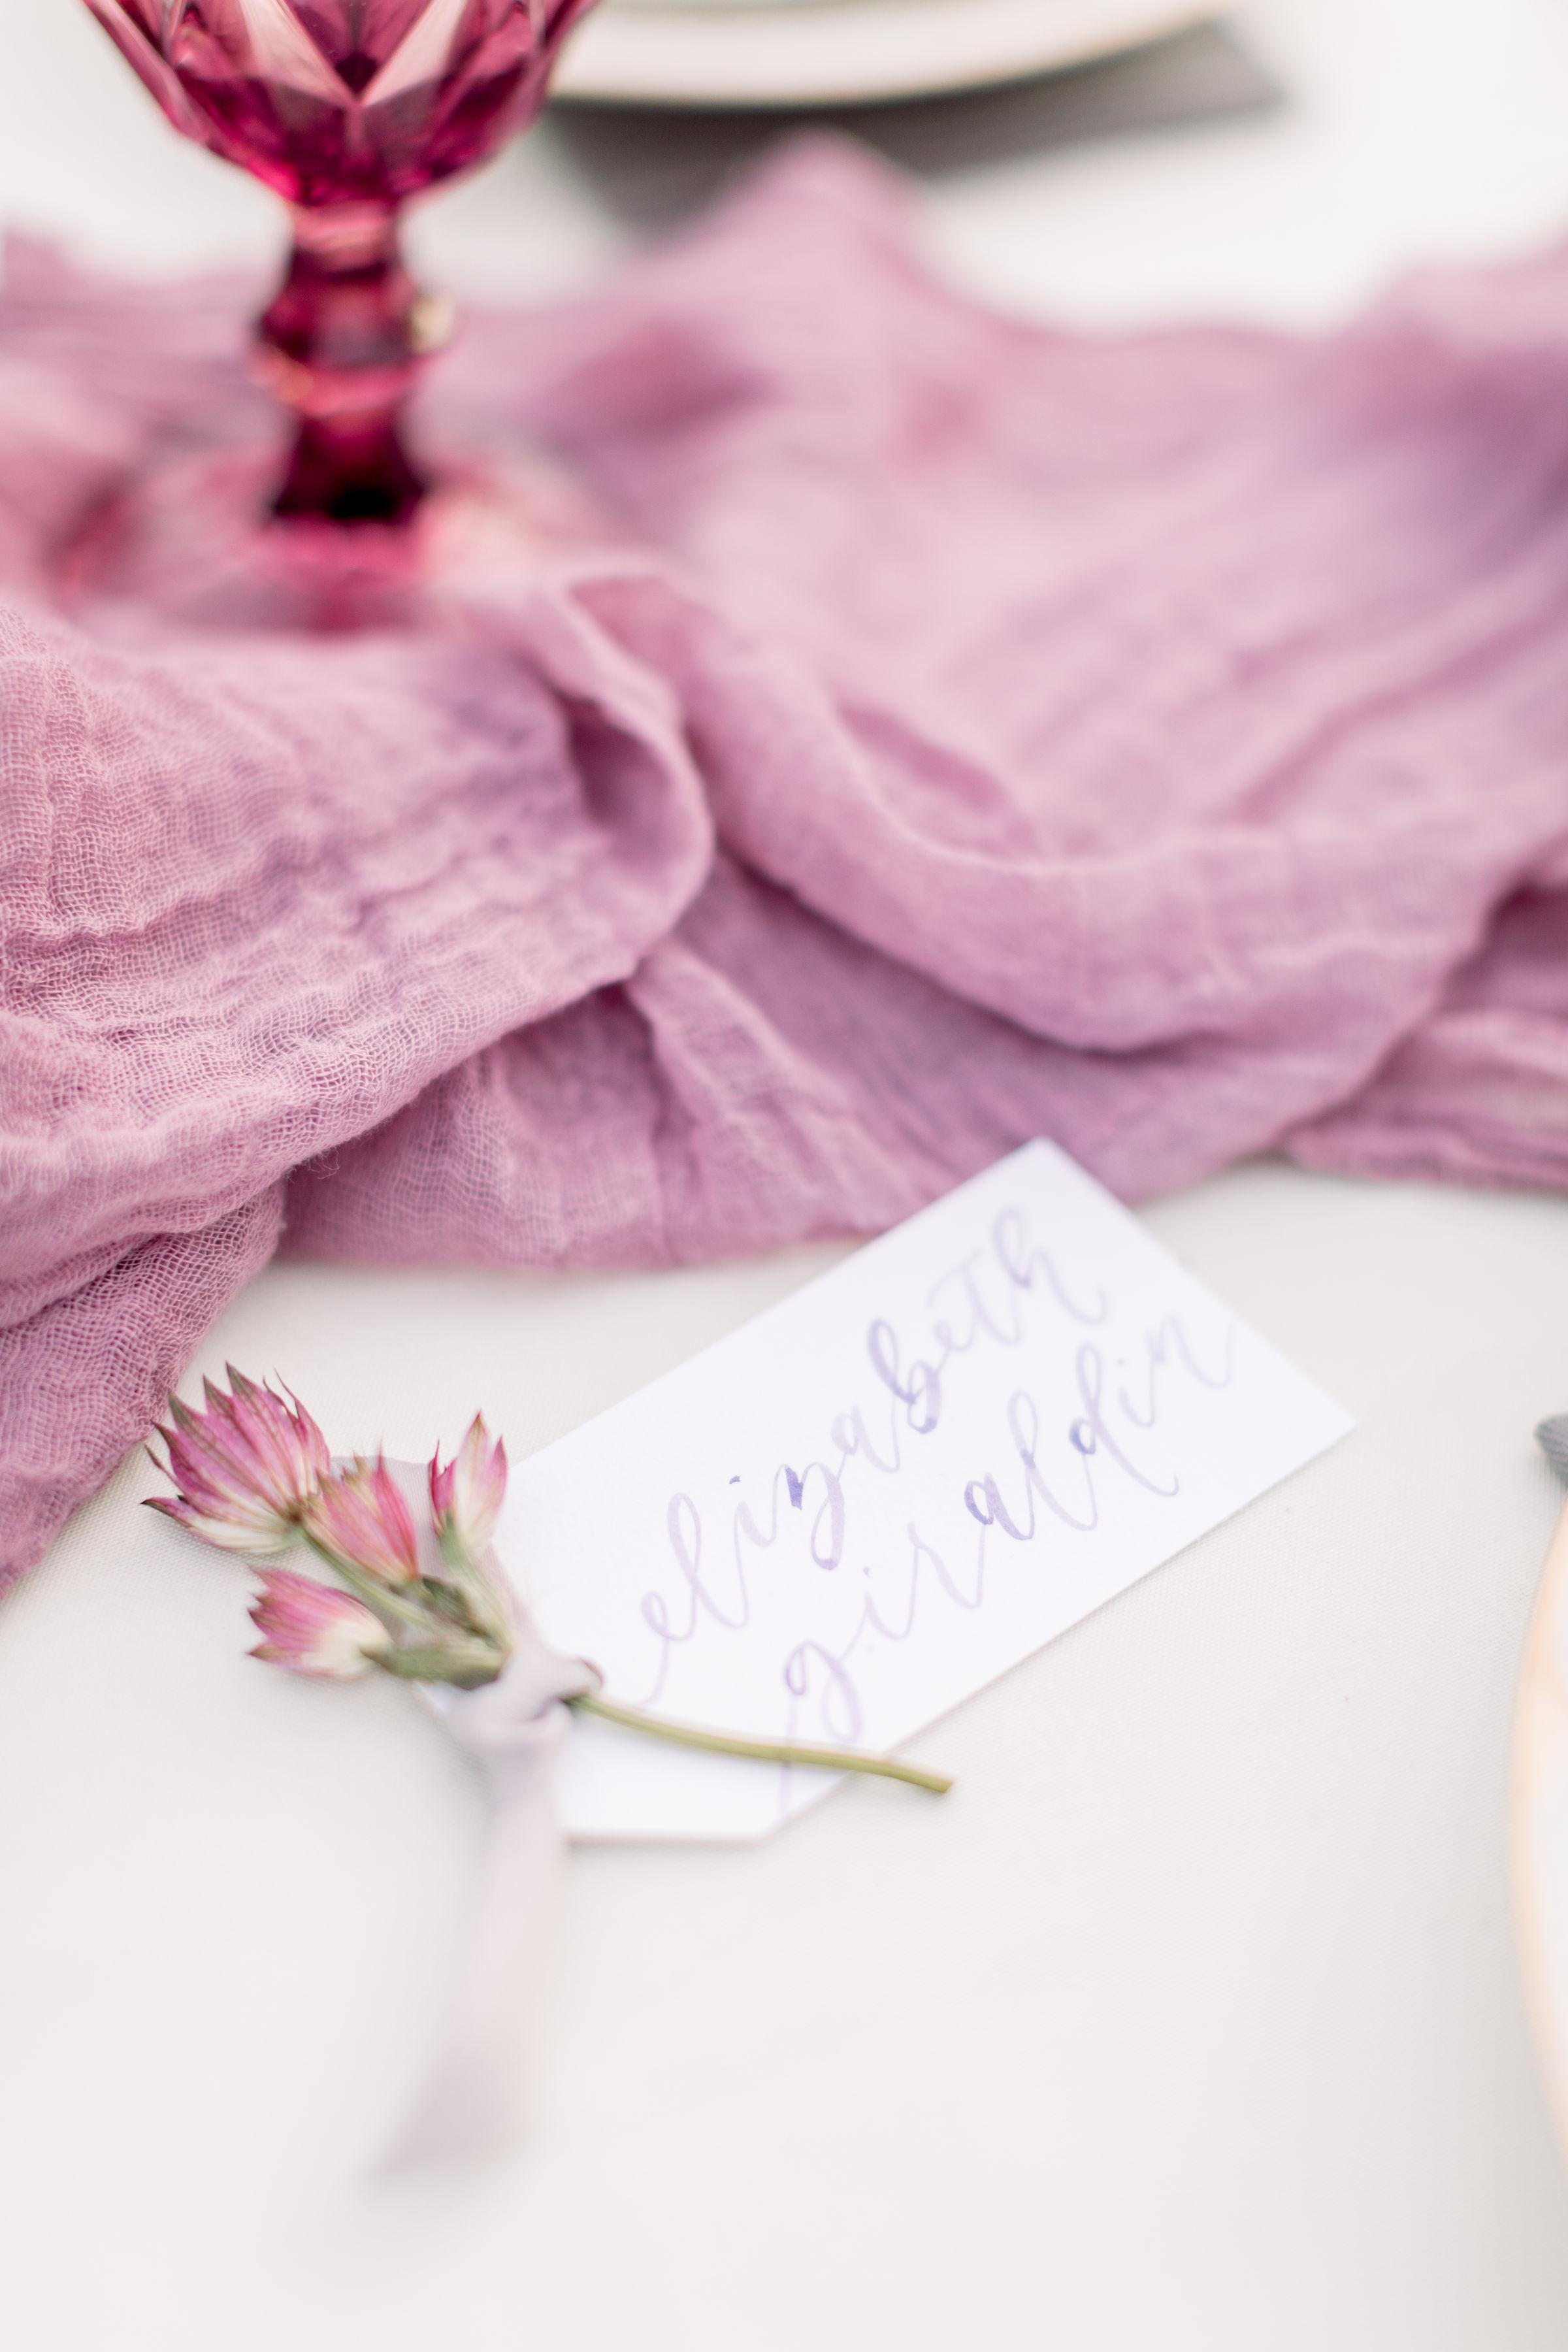 StephanieWeberPhotography-Purple Wedding tablescape – Sam Allen Creates Watercolor Placecards